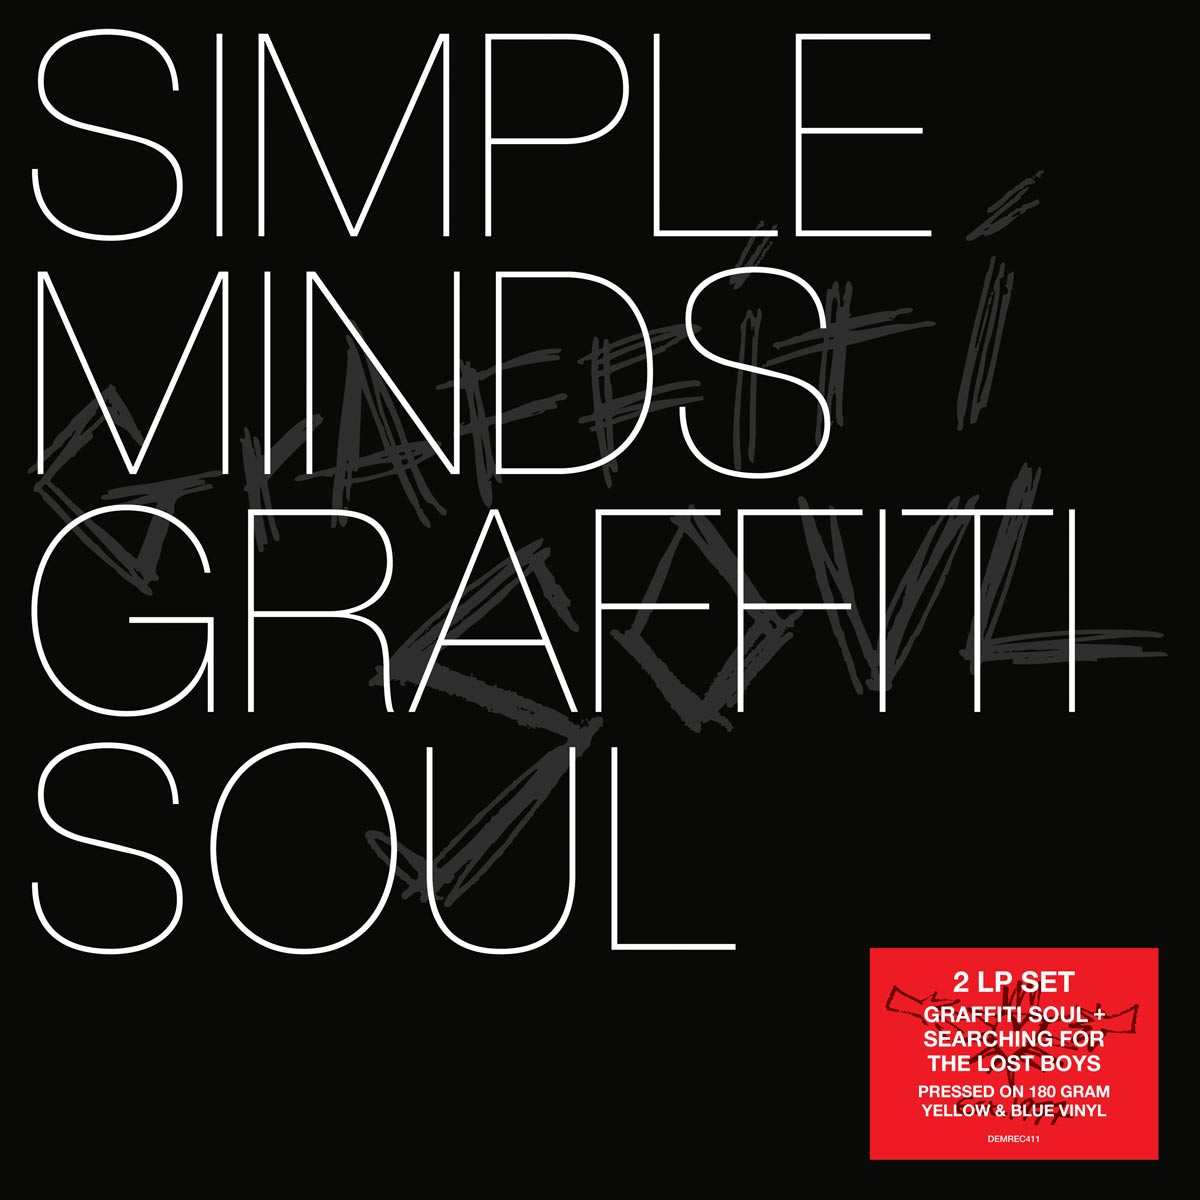 10th anniversary release of graffiti soul 2lp set